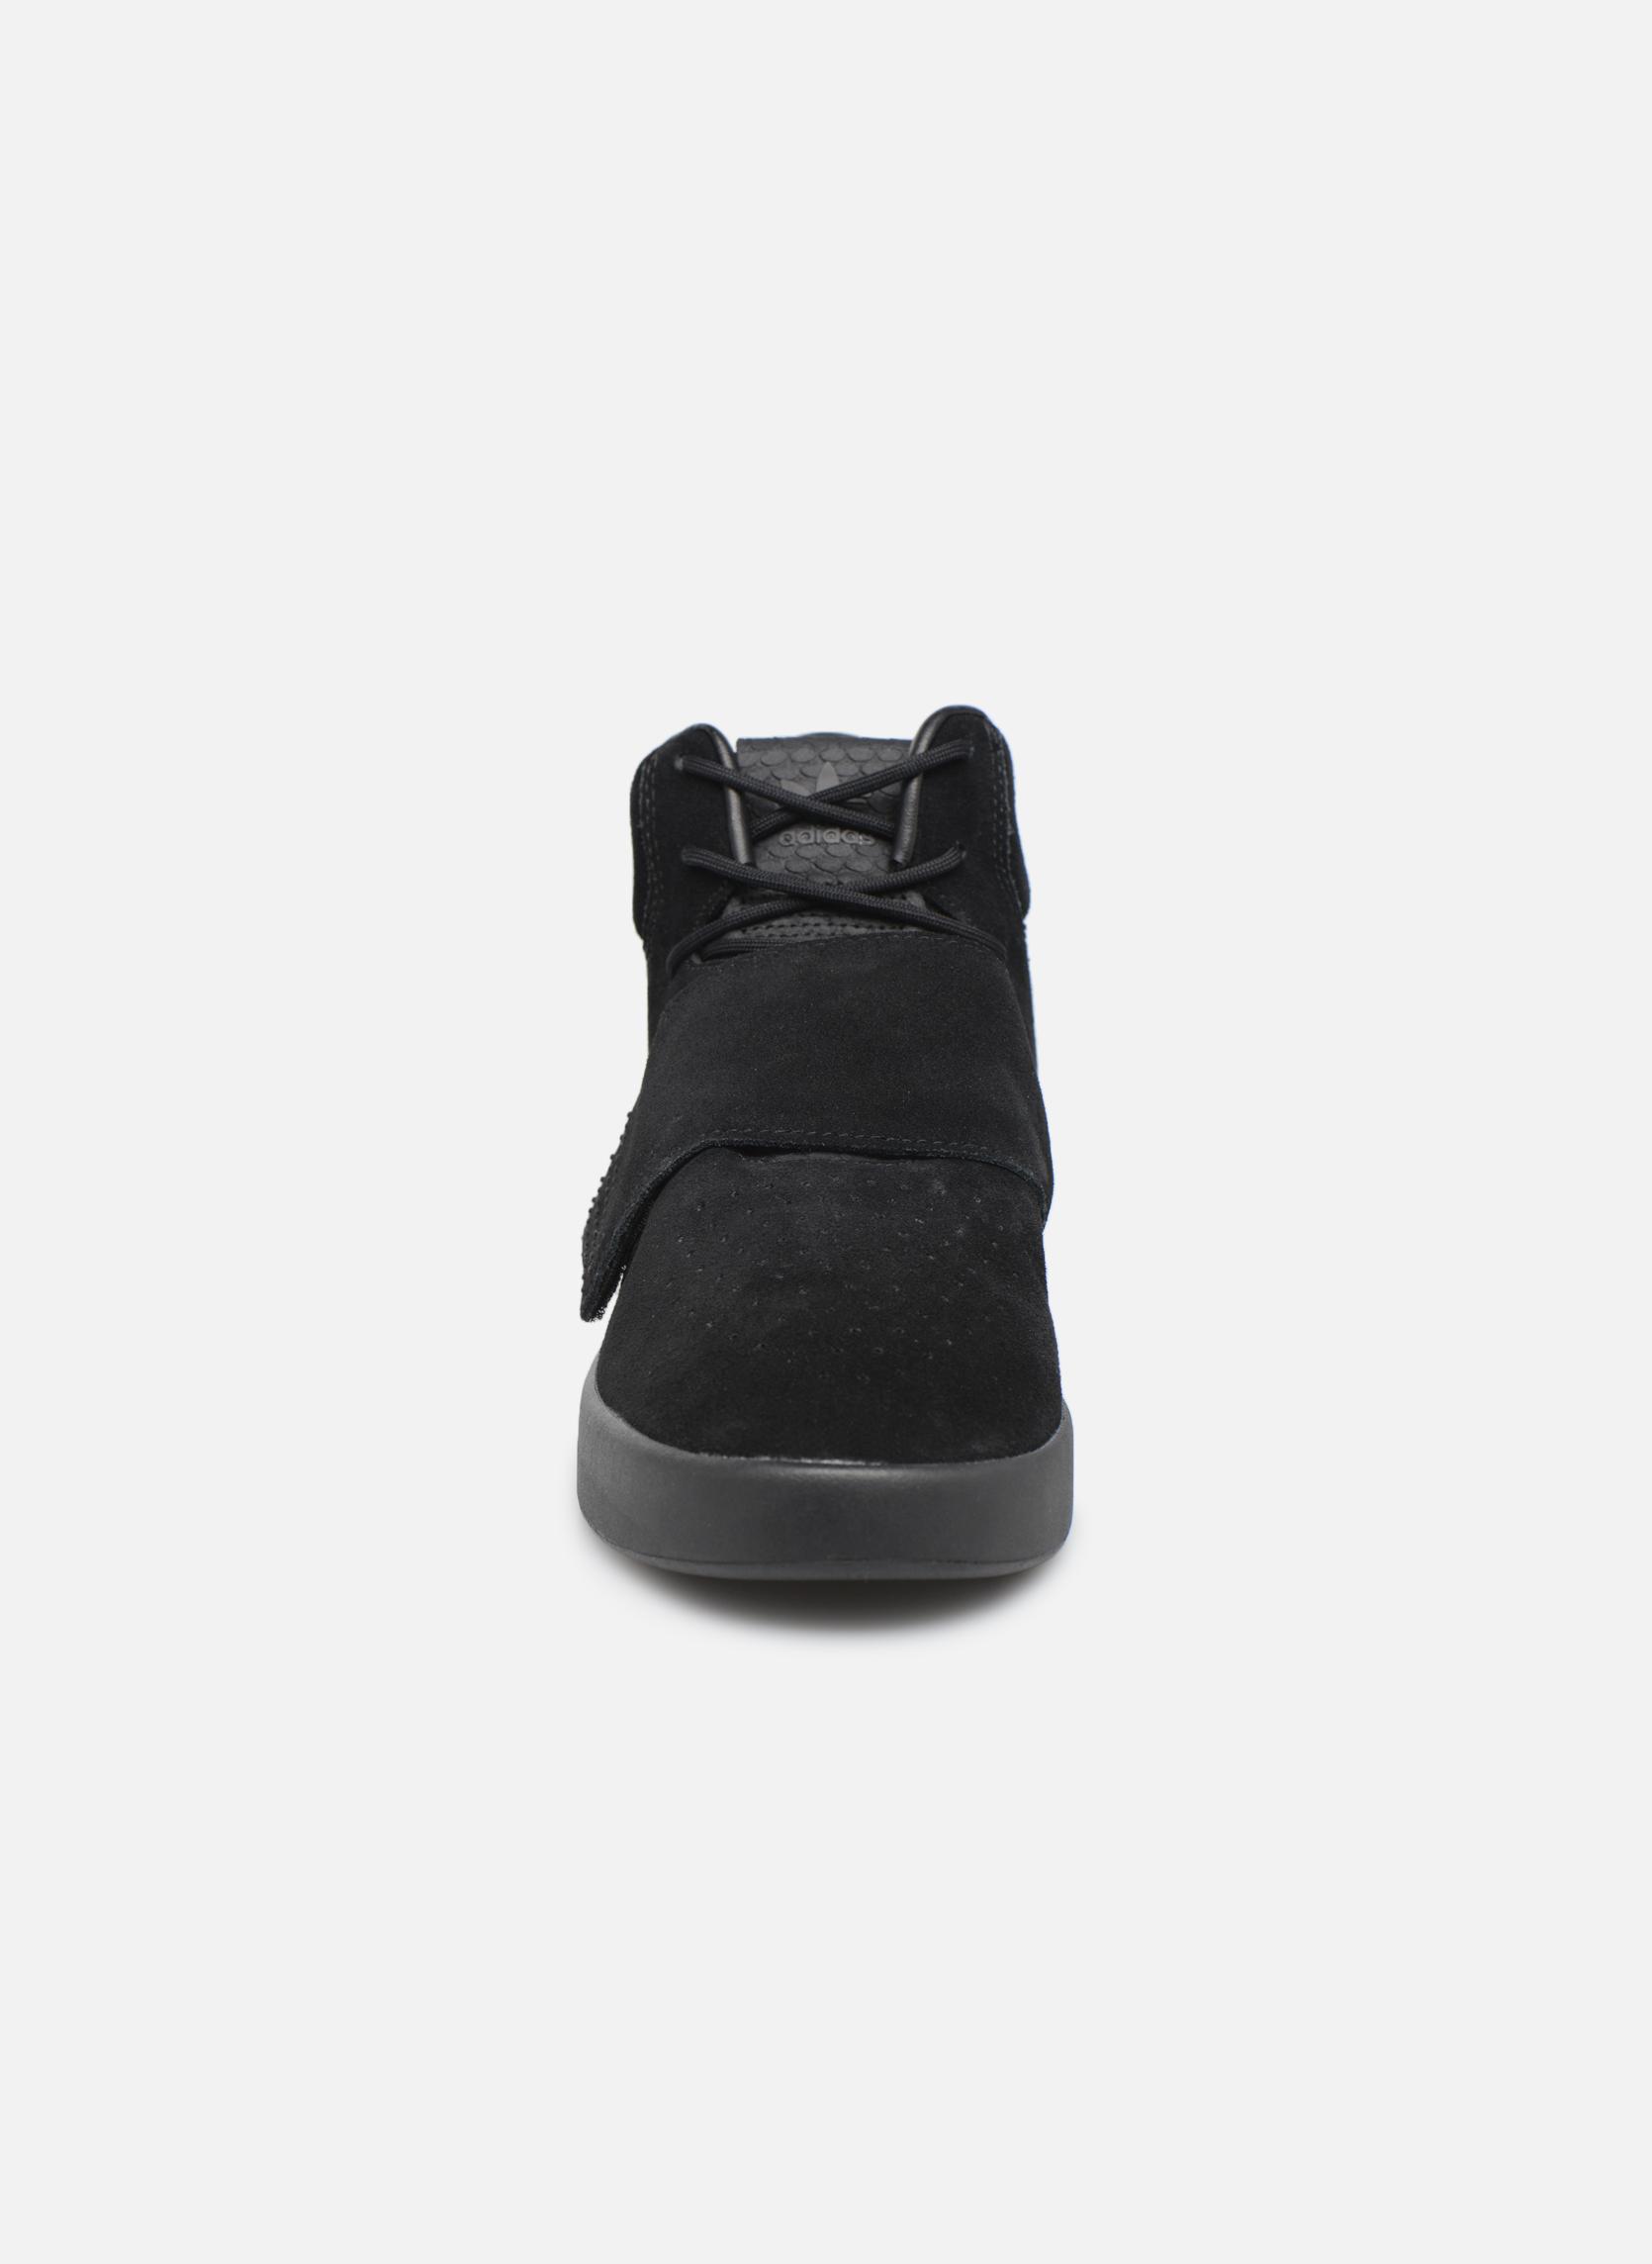 Baskets Adidas Originals Tubular Invader Strap Noir vue portées chaussures